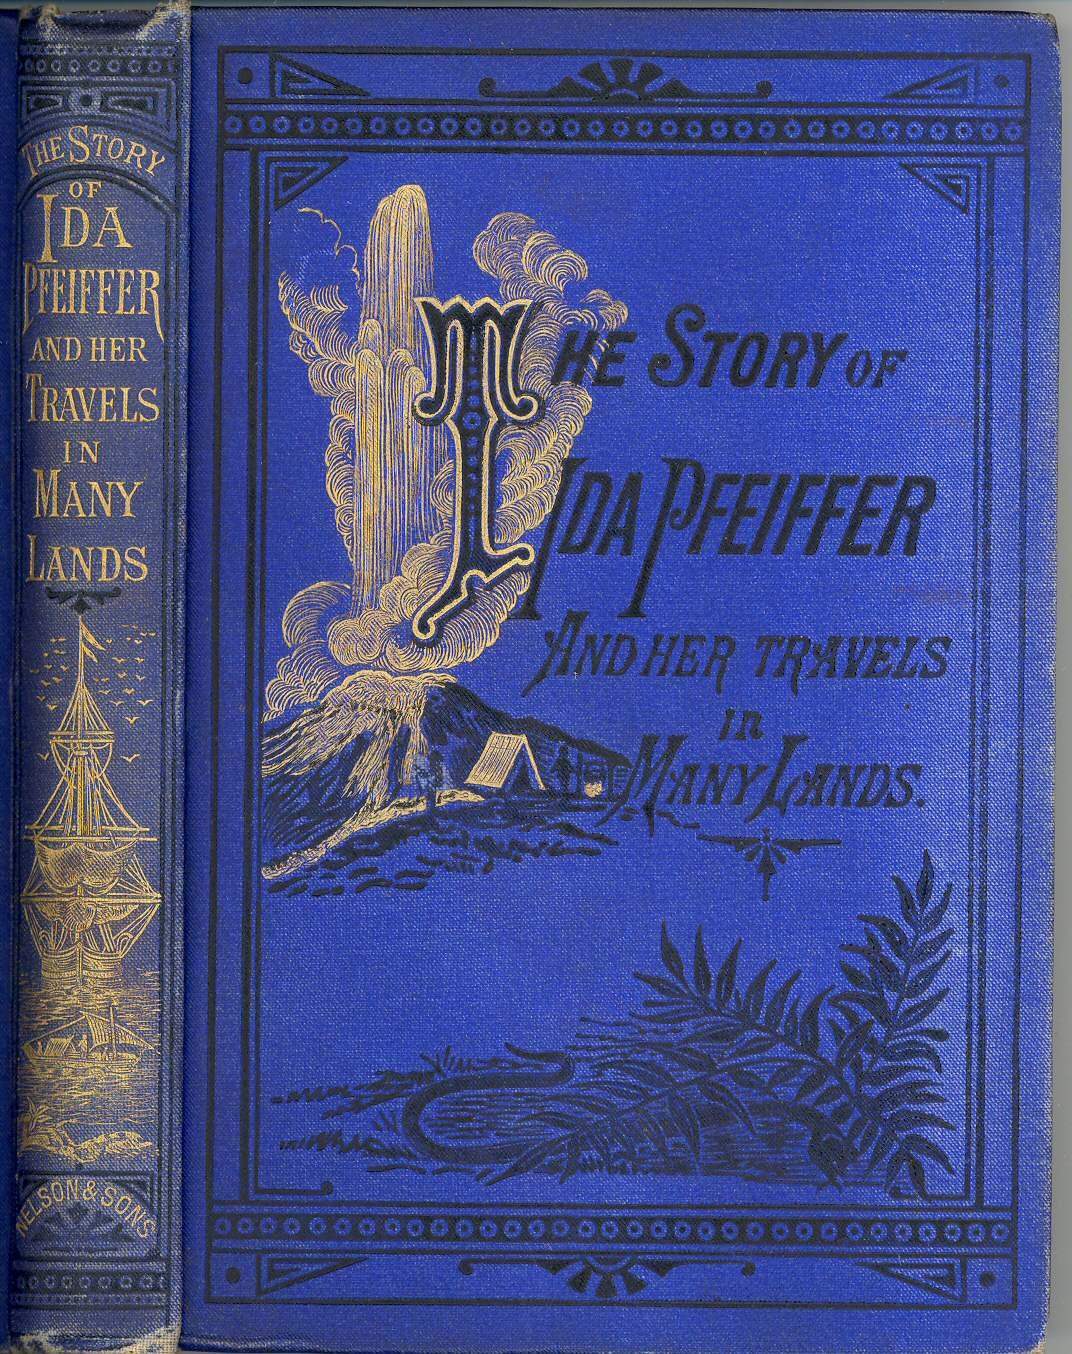 ac9332478b0 The Story of Ida Pfeiffer